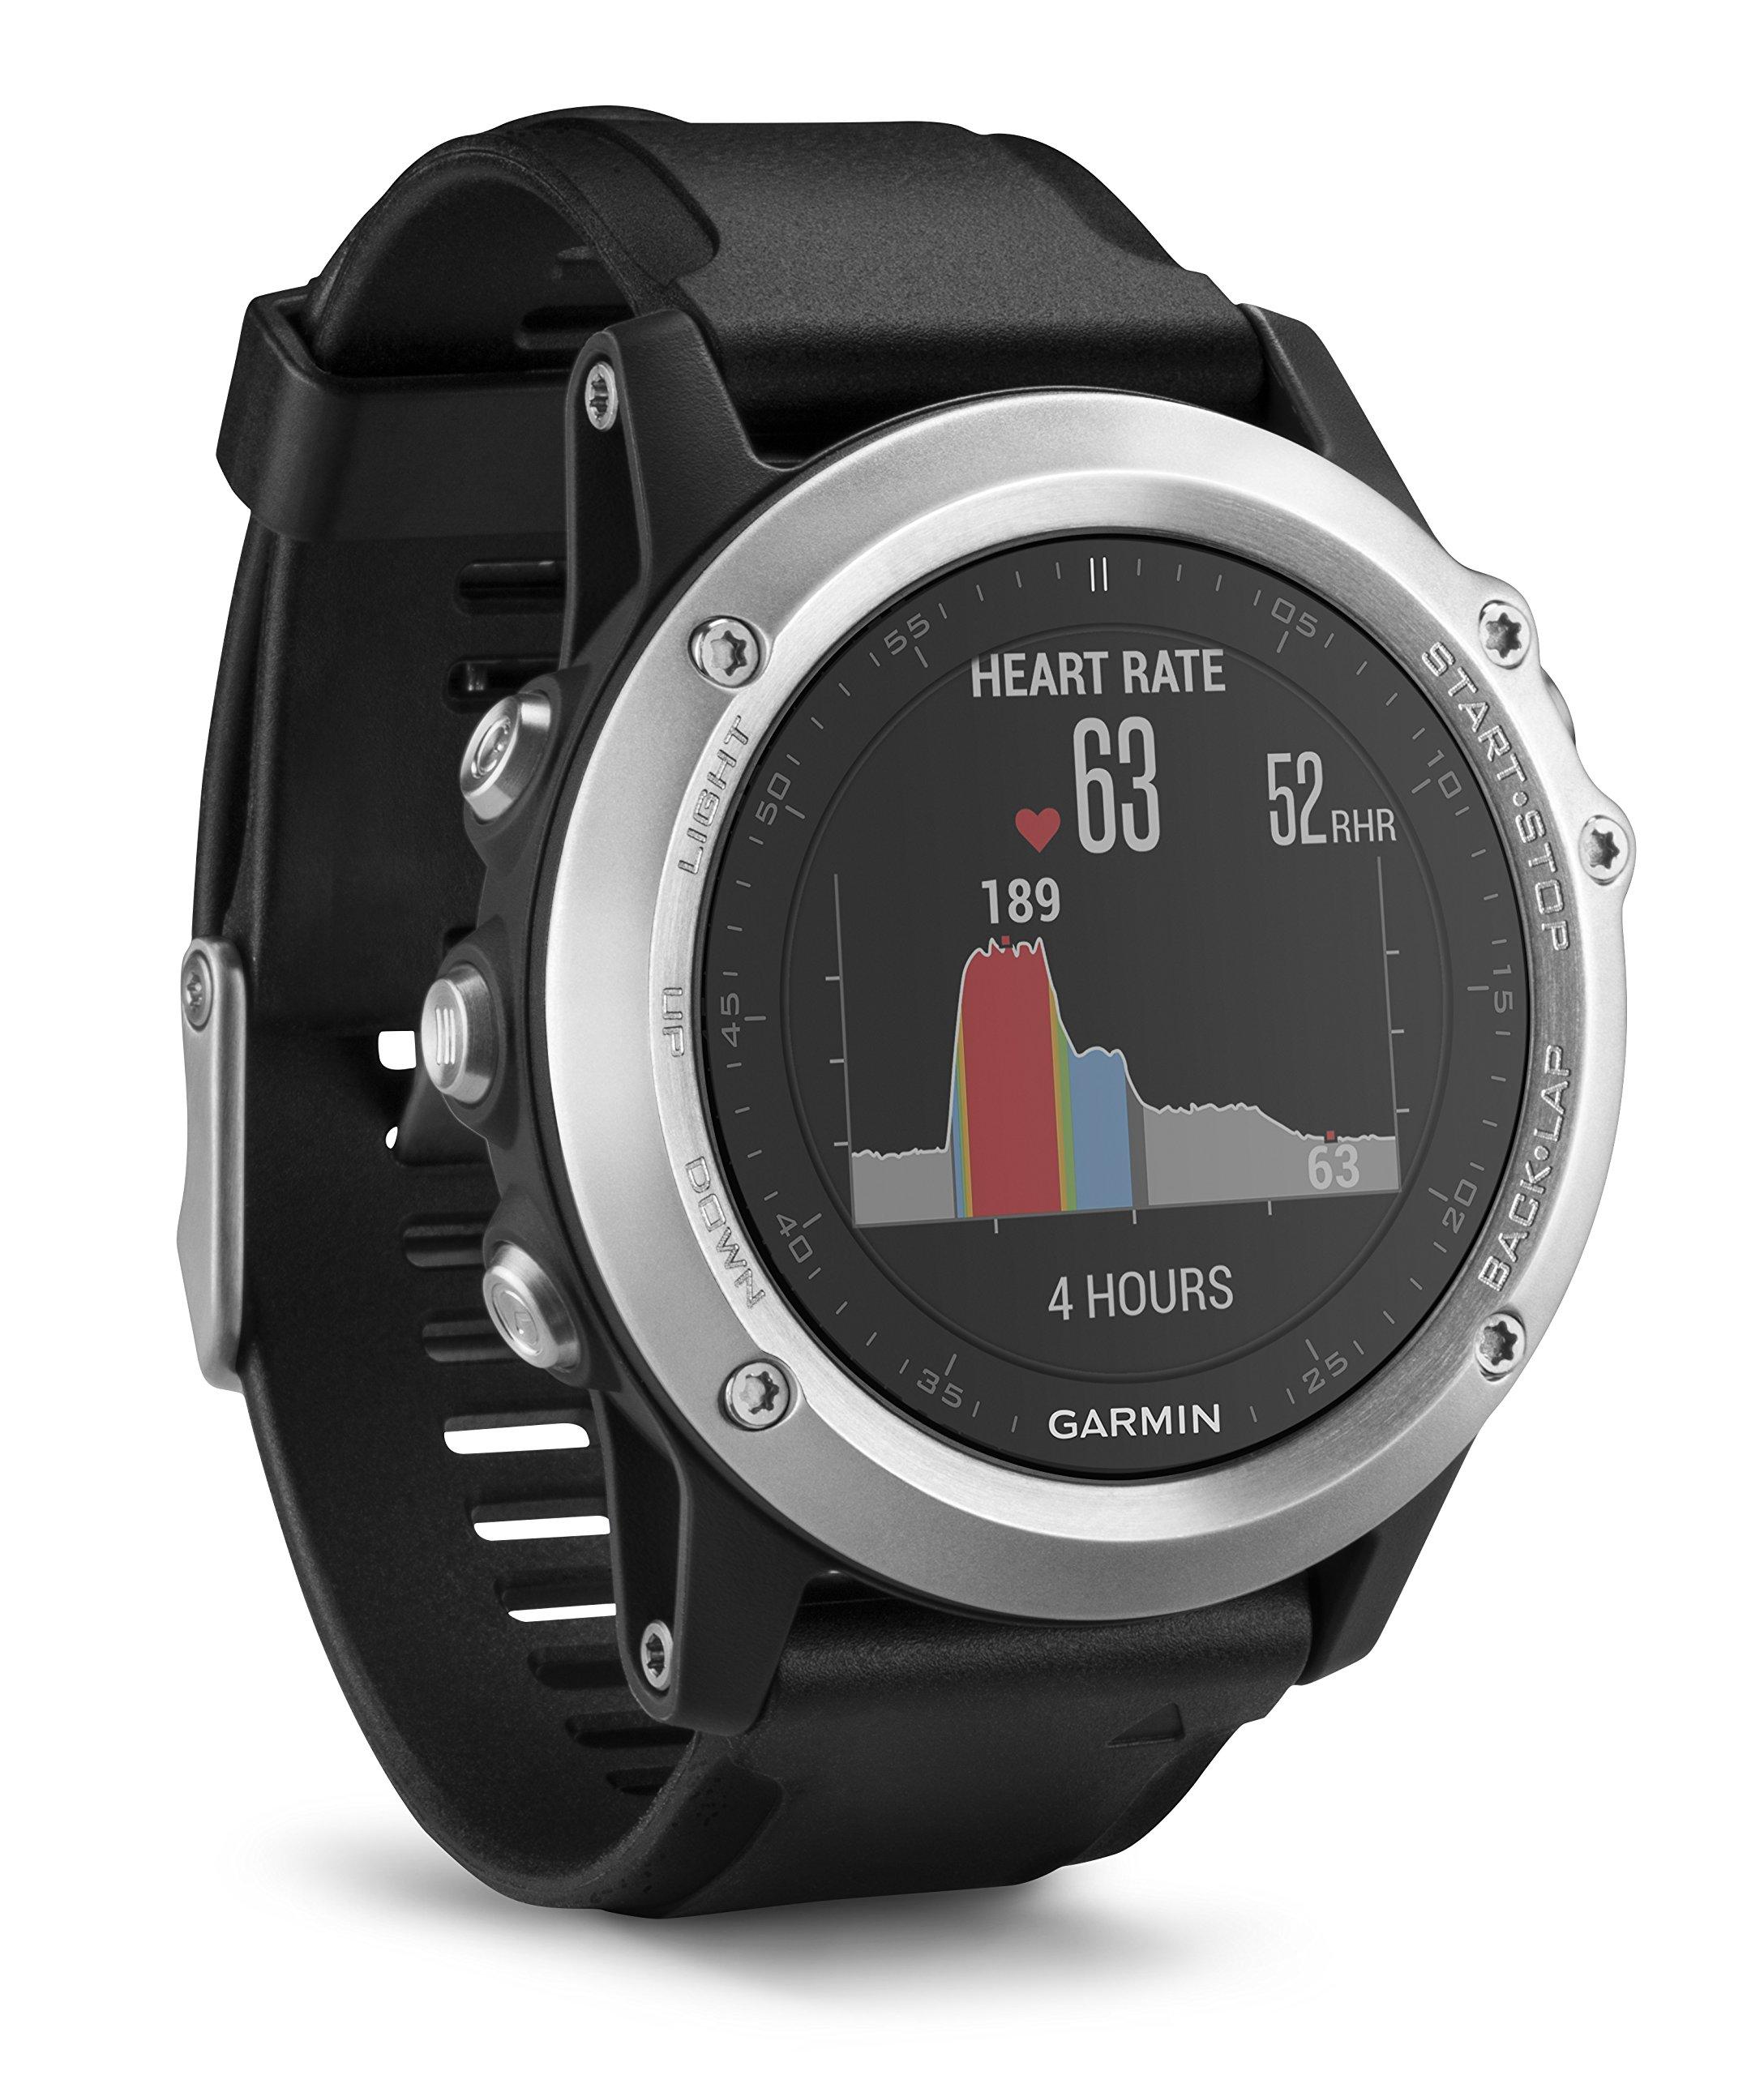 Garmin Fenix 3 HR Smartwatch GPS Multisport, Sensore Cardio al Polso, Display a Colori, Altimetro e Bussola, Nero/Grigio 5 spesavip